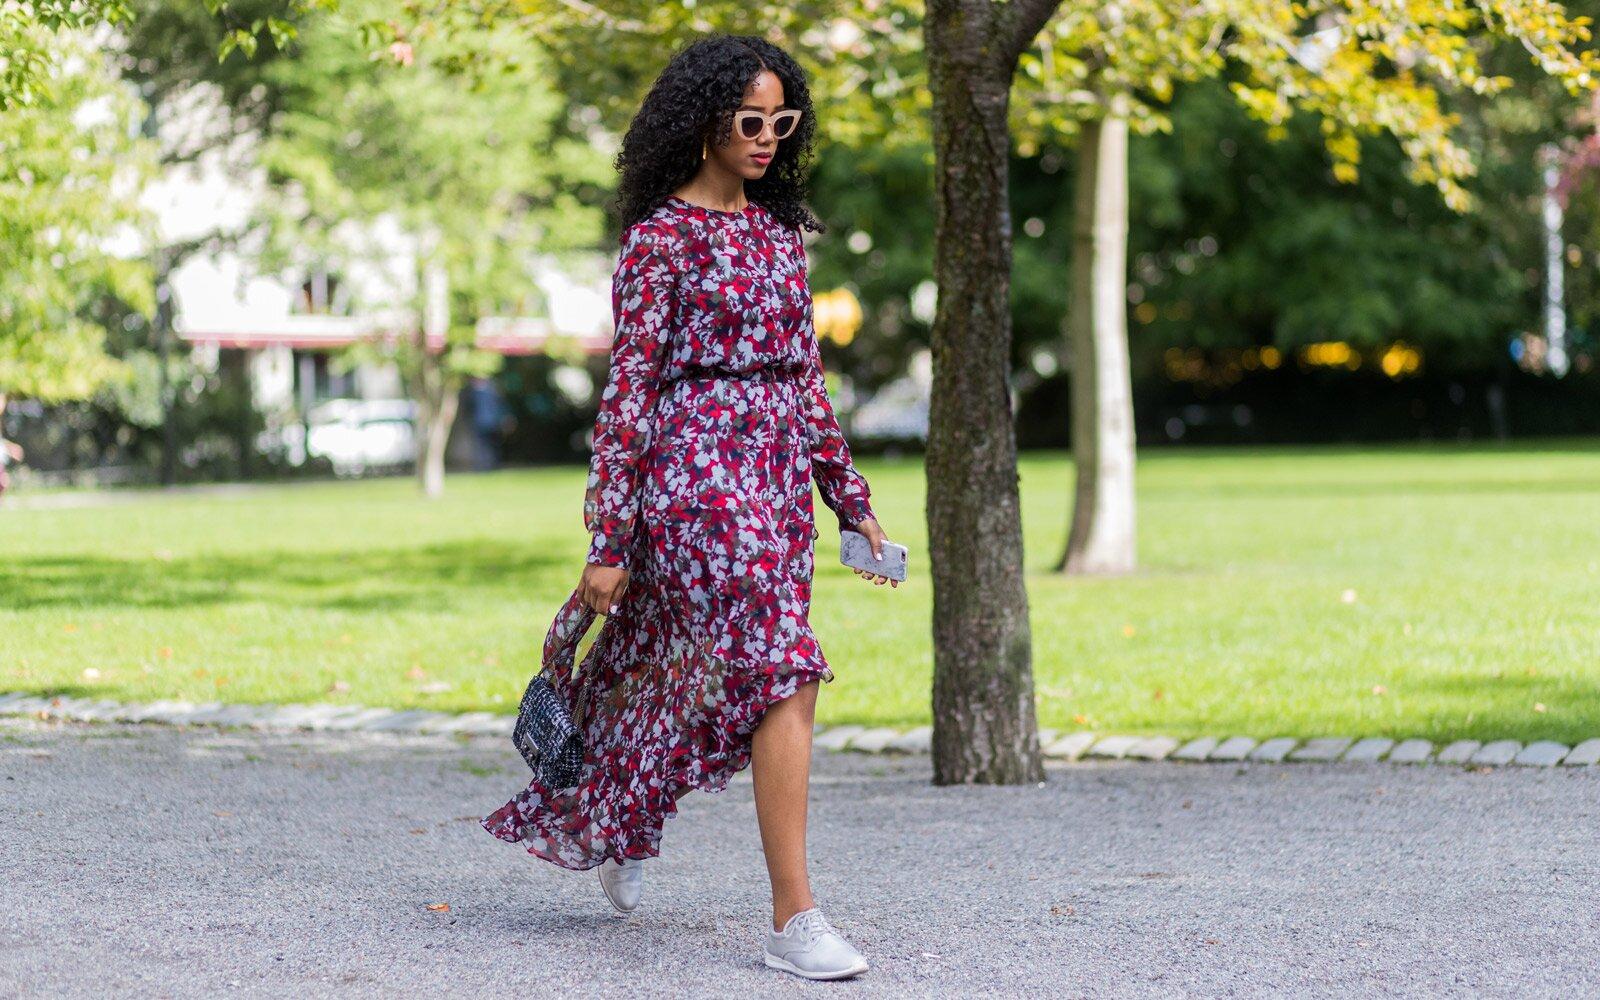 sneakers how to wear ideas boho fashion shoes fashion when dress up